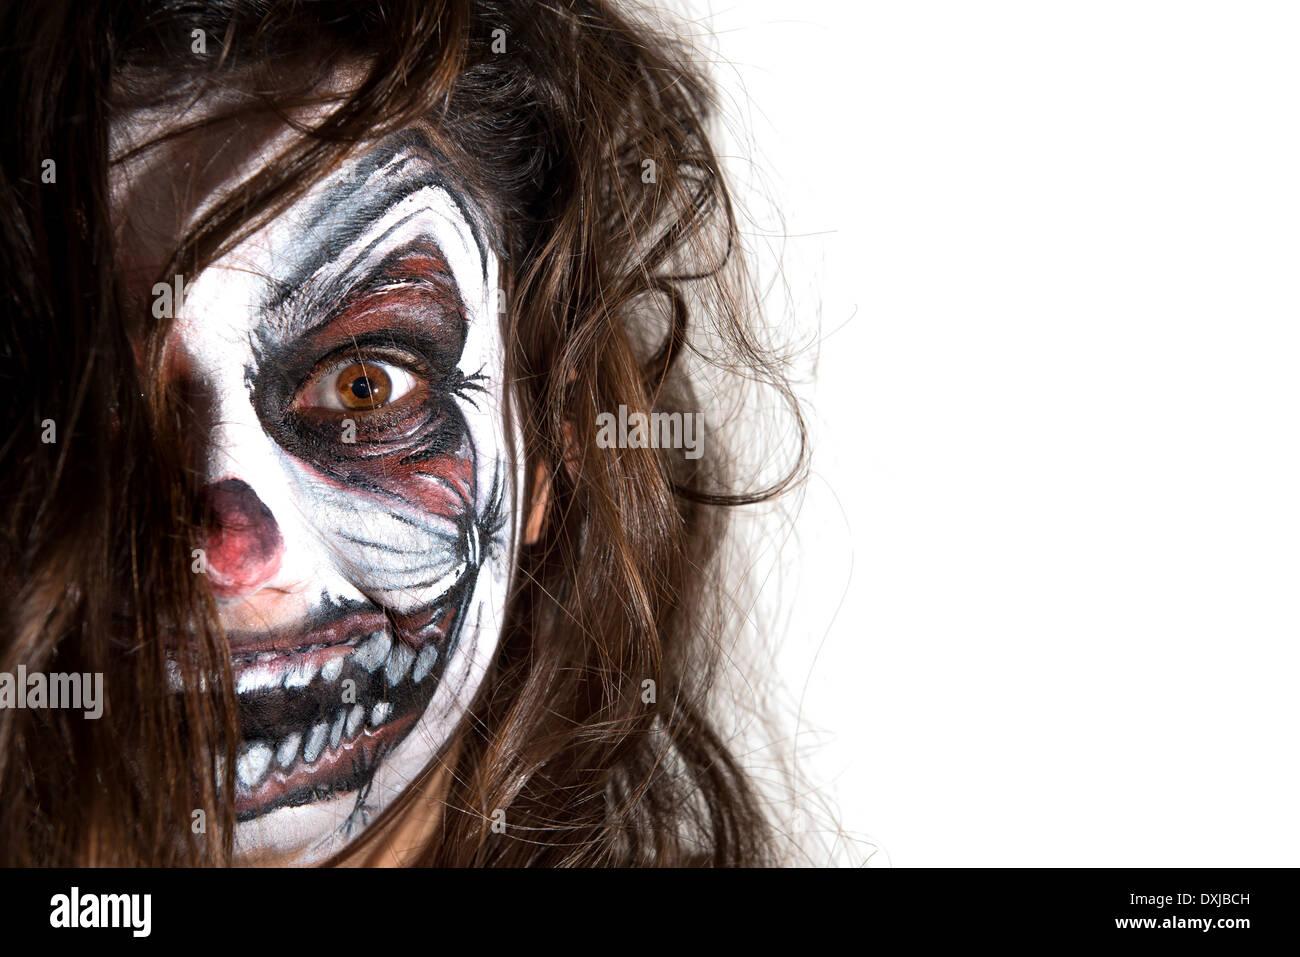 scary clown stockfotos scary clown bilder seite 23 alamy. Black Bedroom Furniture Sets. Home Design Ideas